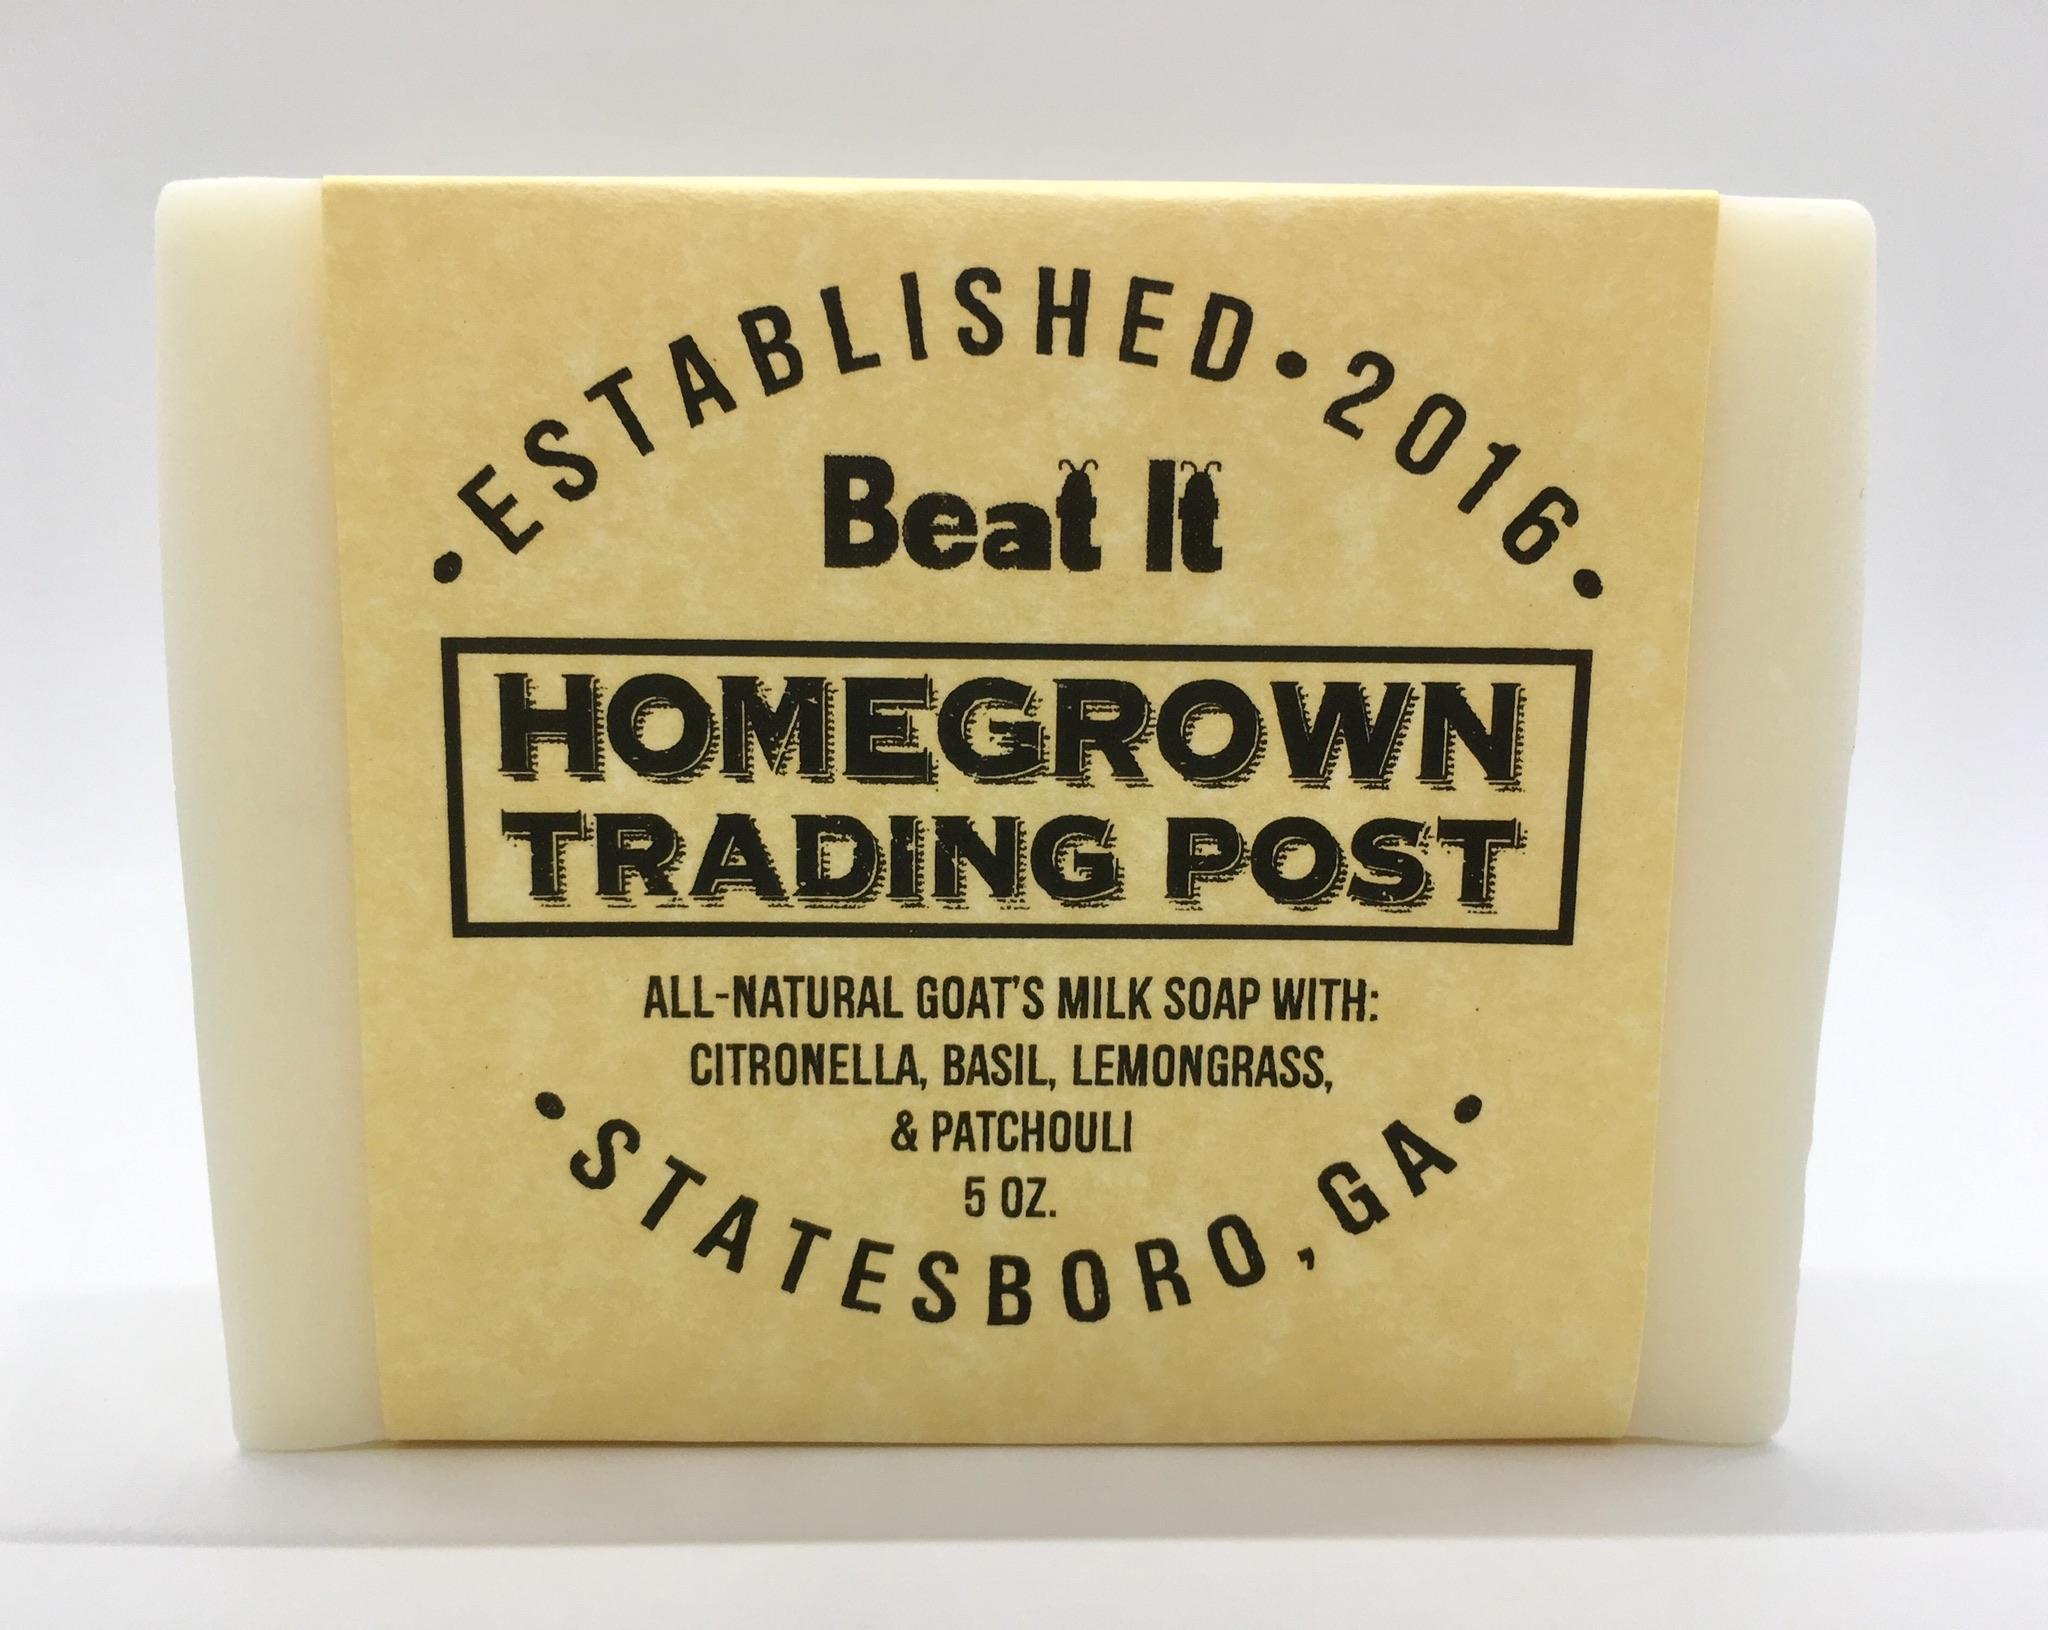 Beat It - Goat's Milk Soap